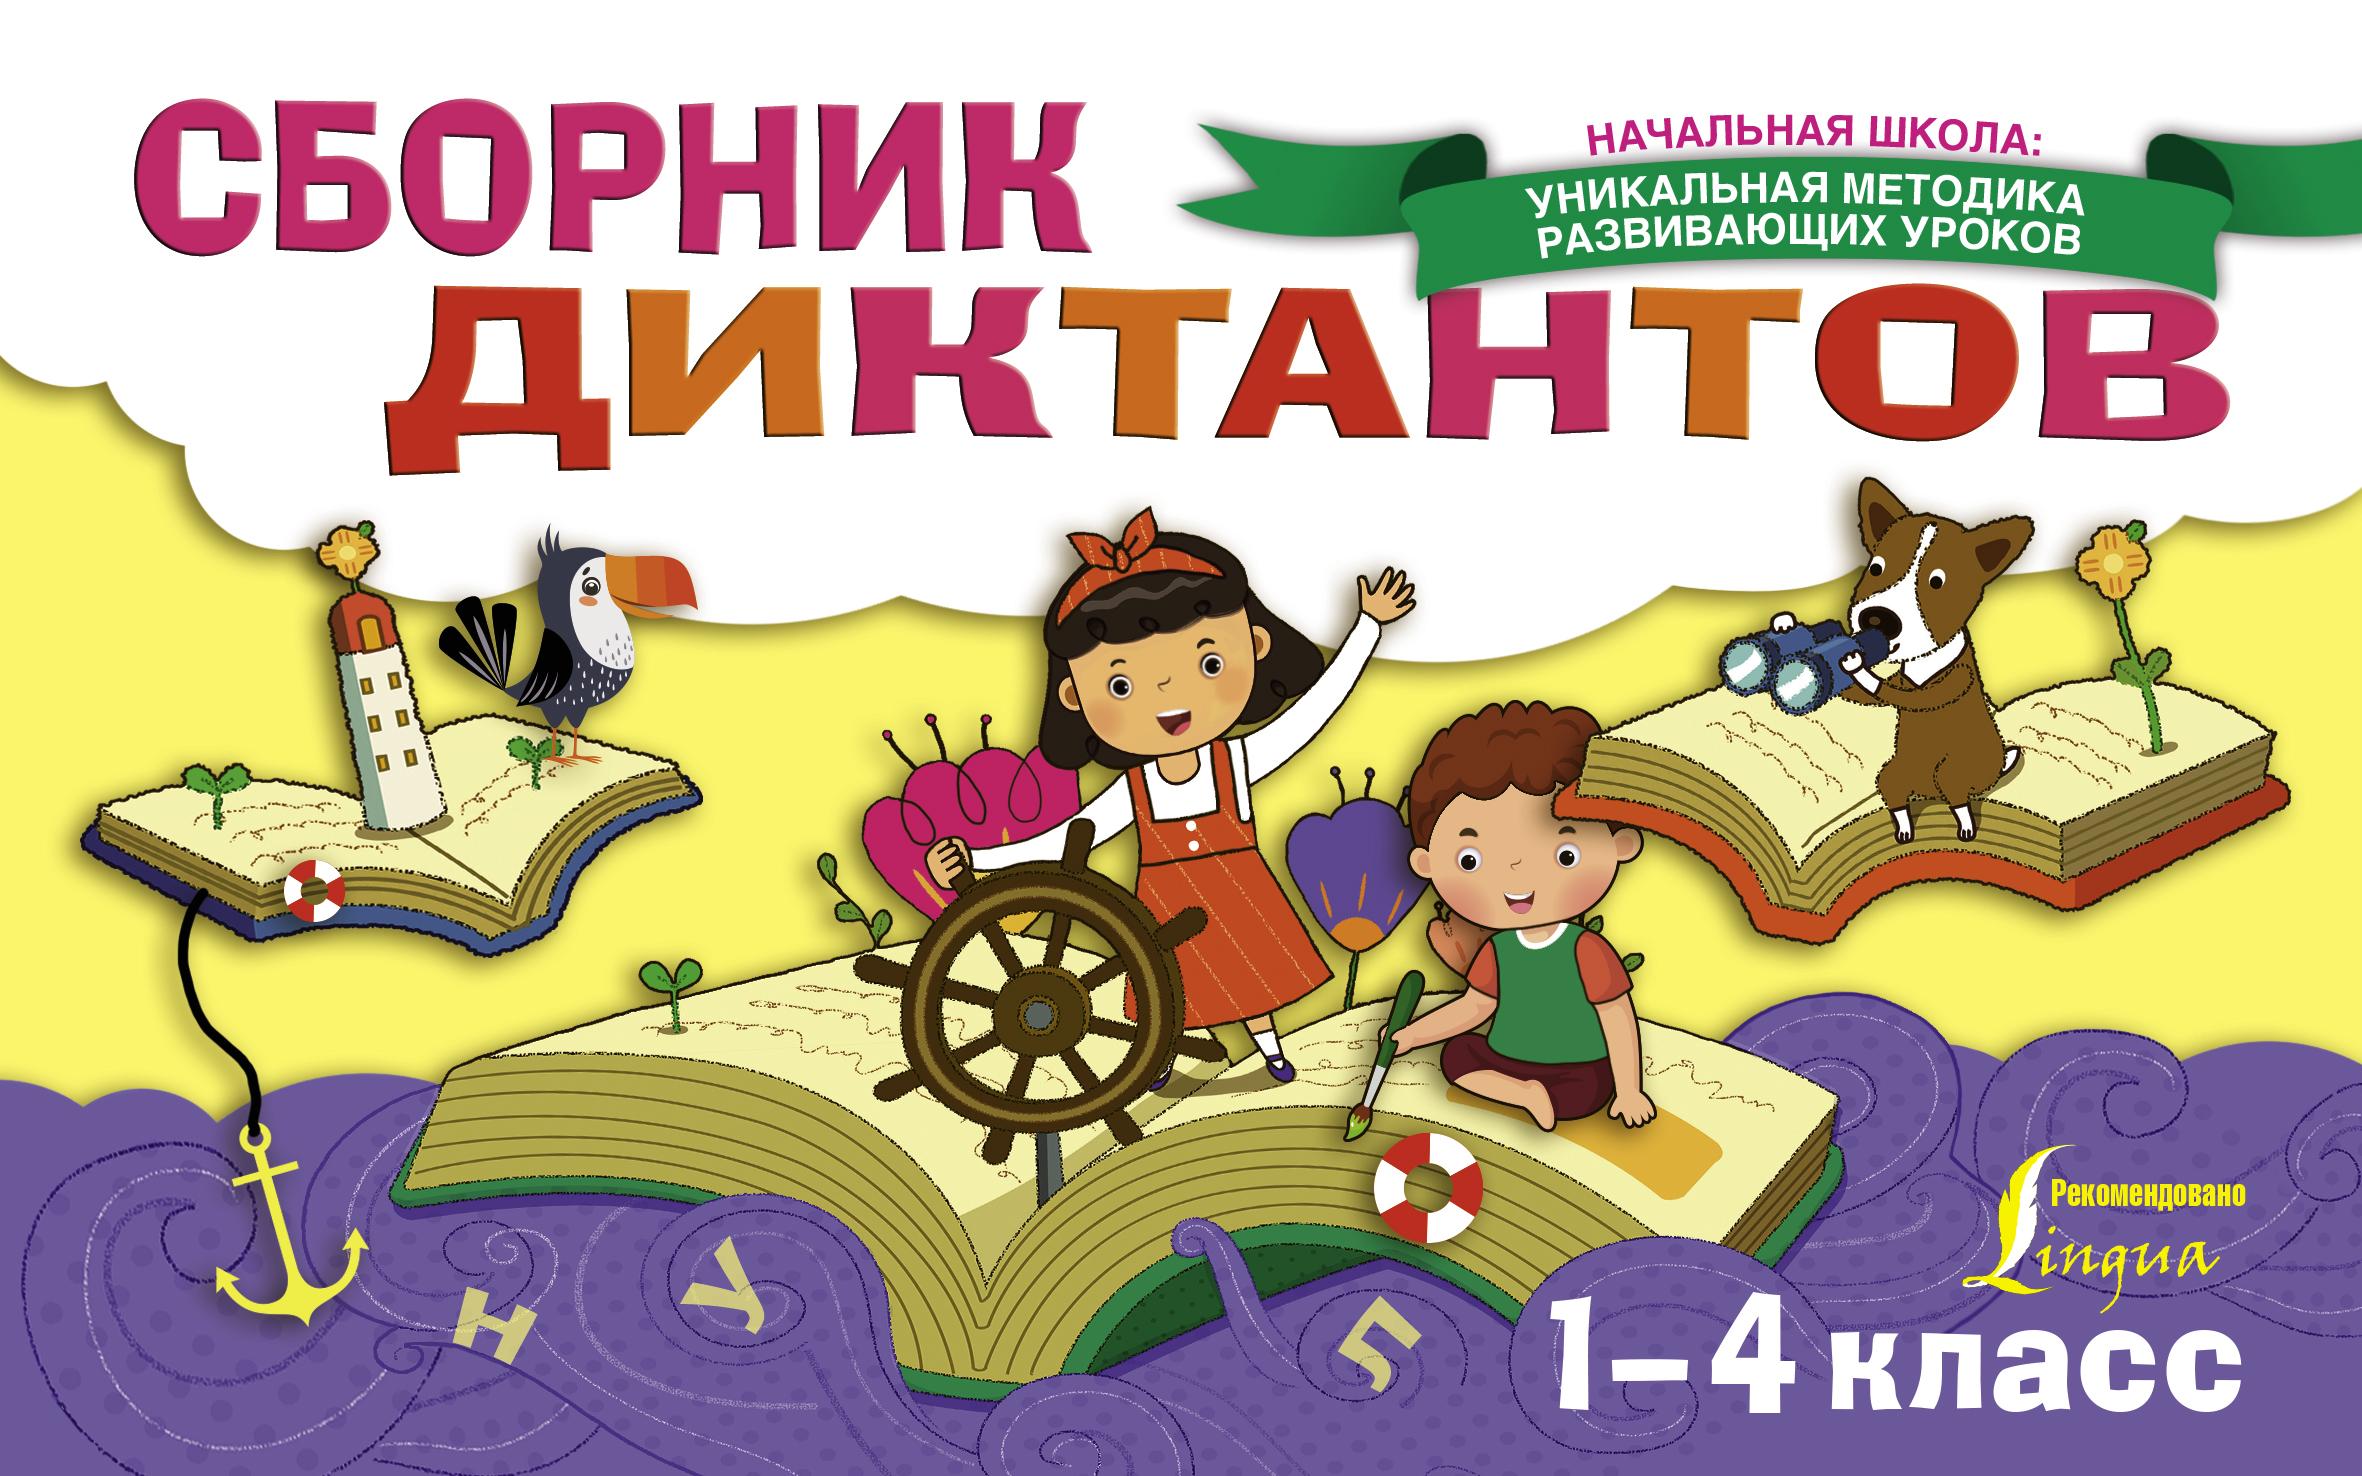 Сборник диктантов. 1-4 класс ( Страхова Е.С.  )